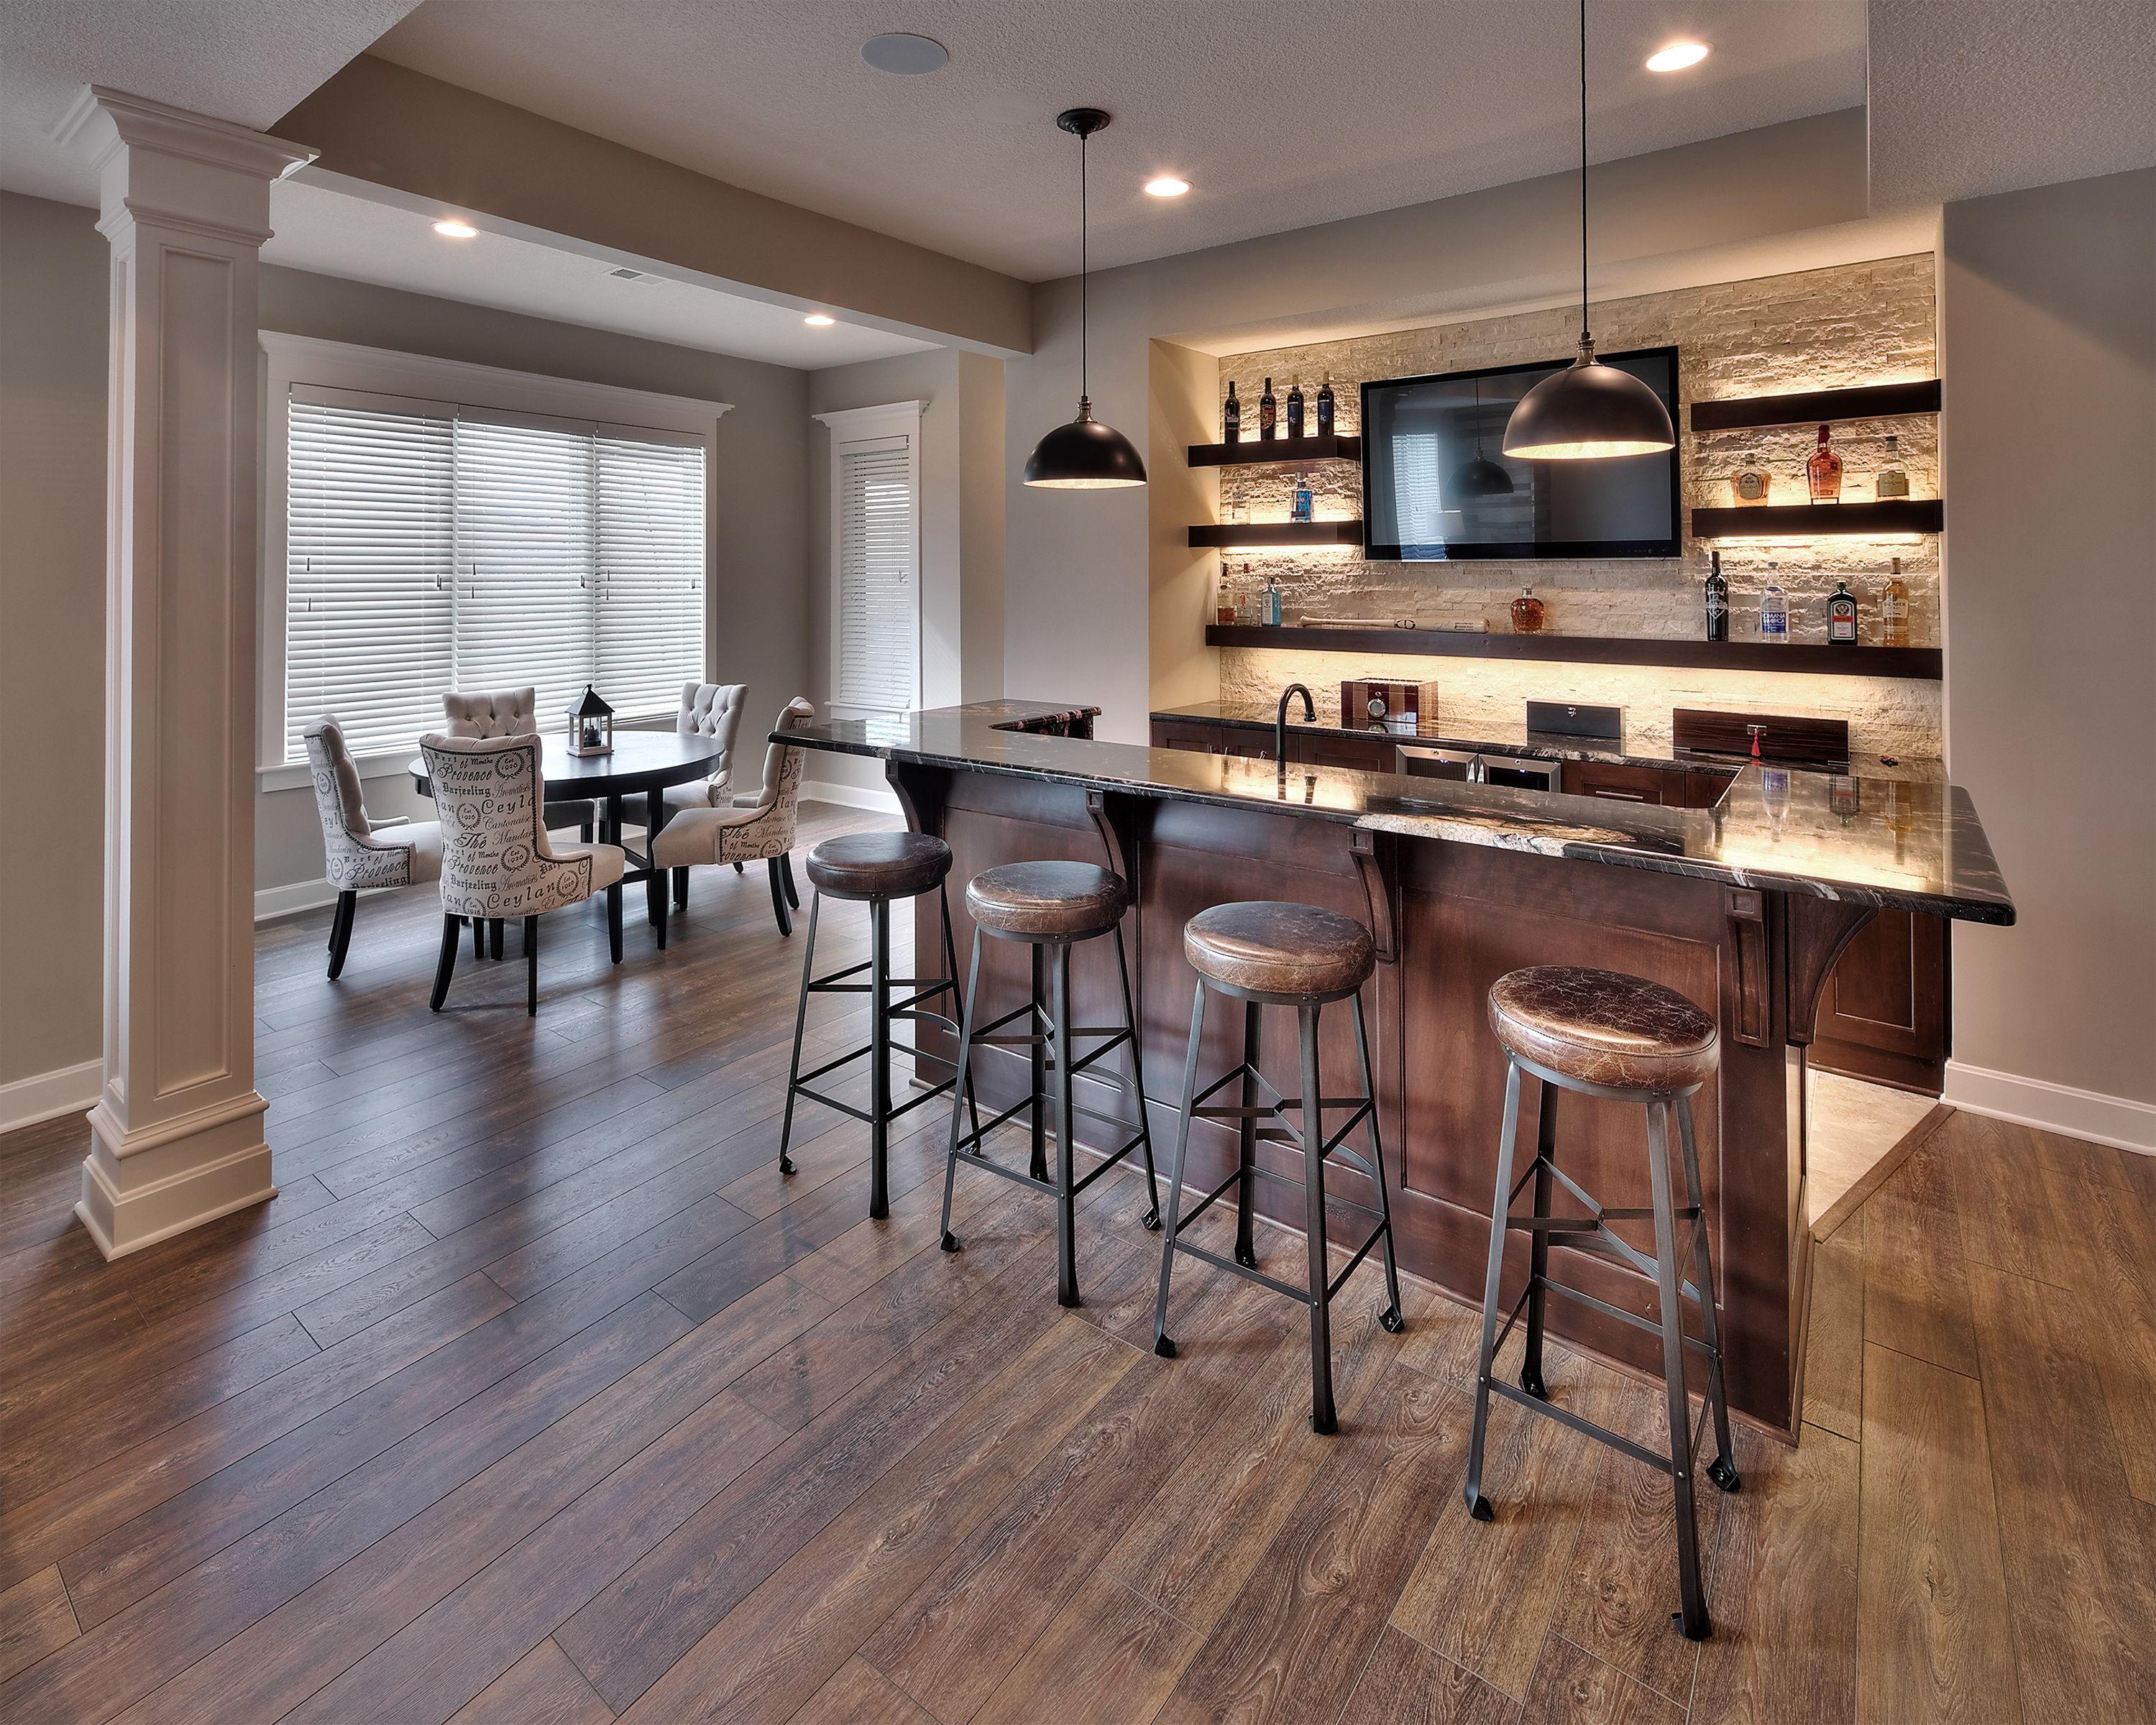 Home Bar Granite Counter Top Light Up Bar Mounted Tv